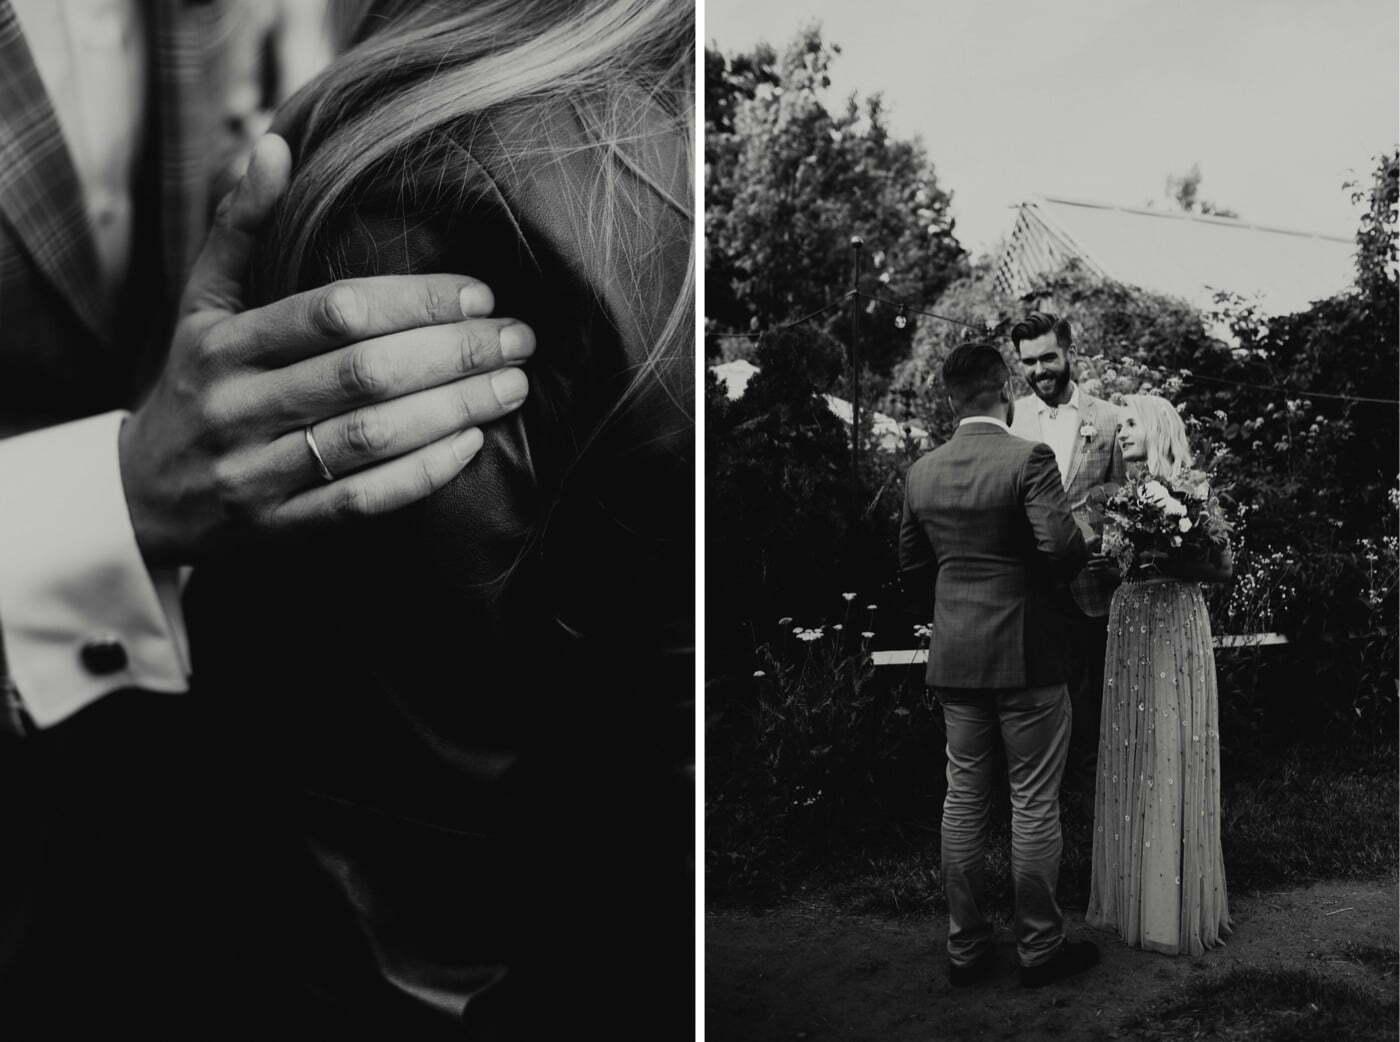 ewelina zieba rustykalne wesele stara oranzeria warszawa 054